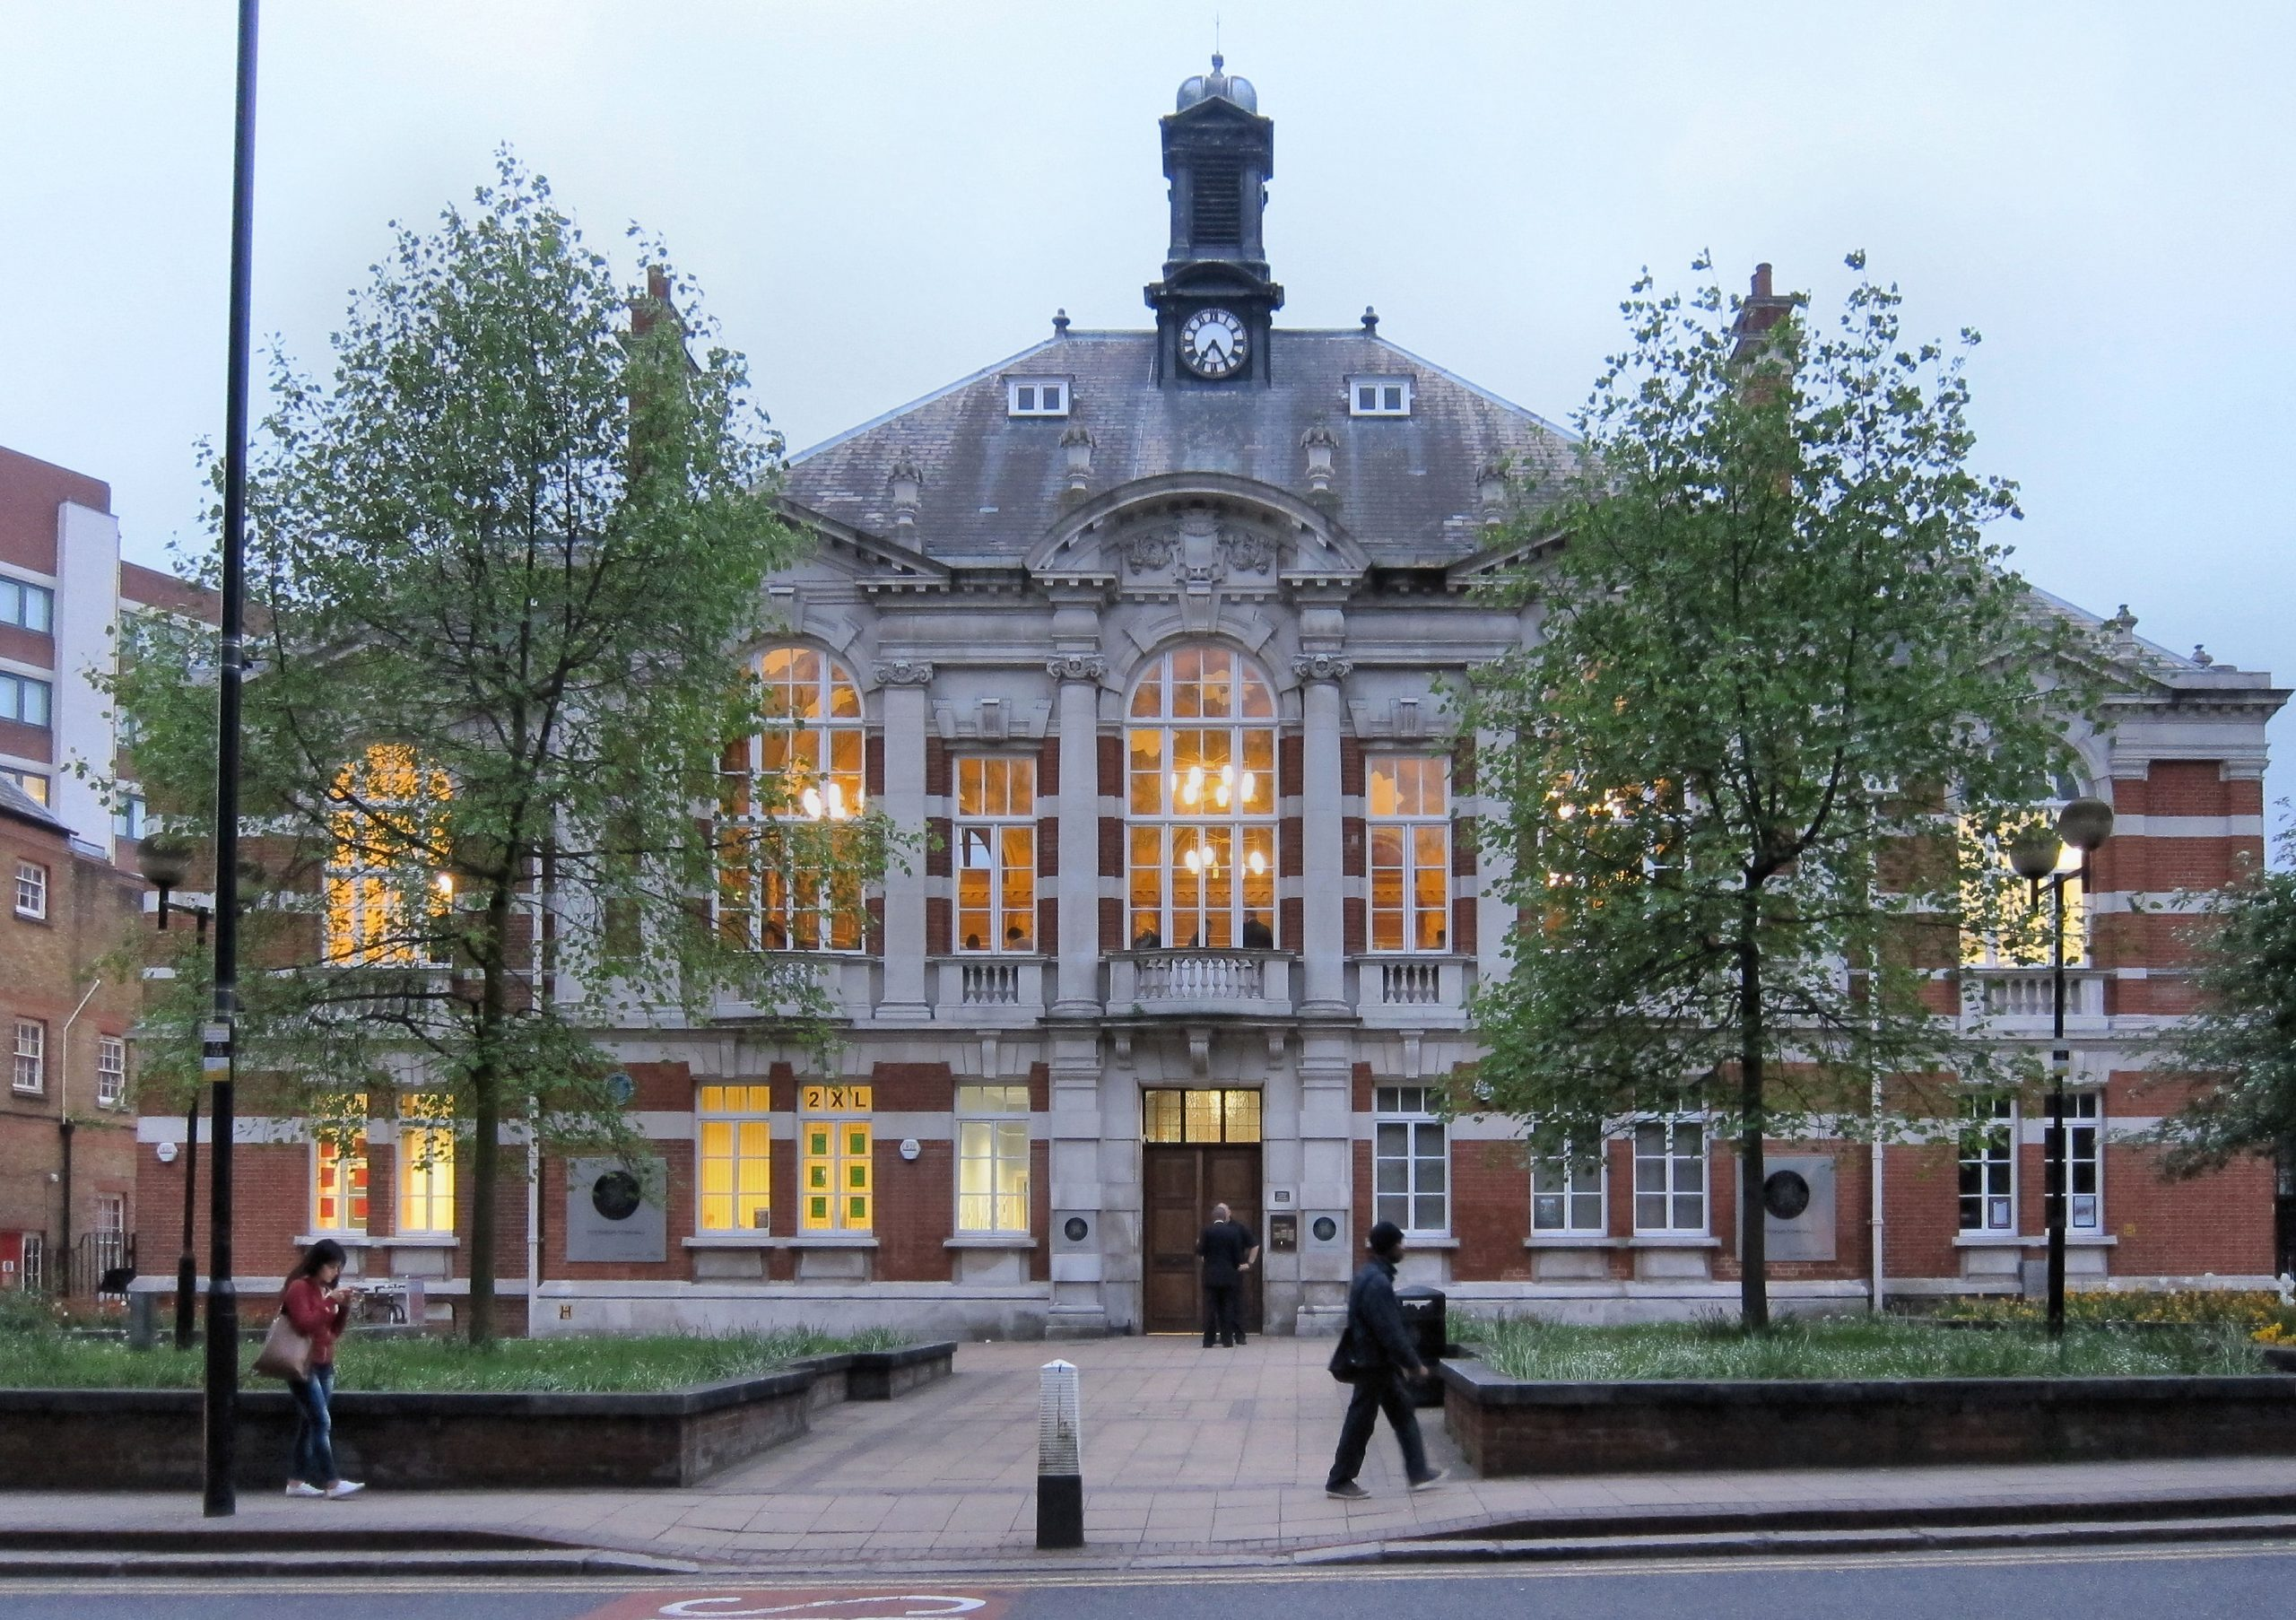 Tottenham-town-hall